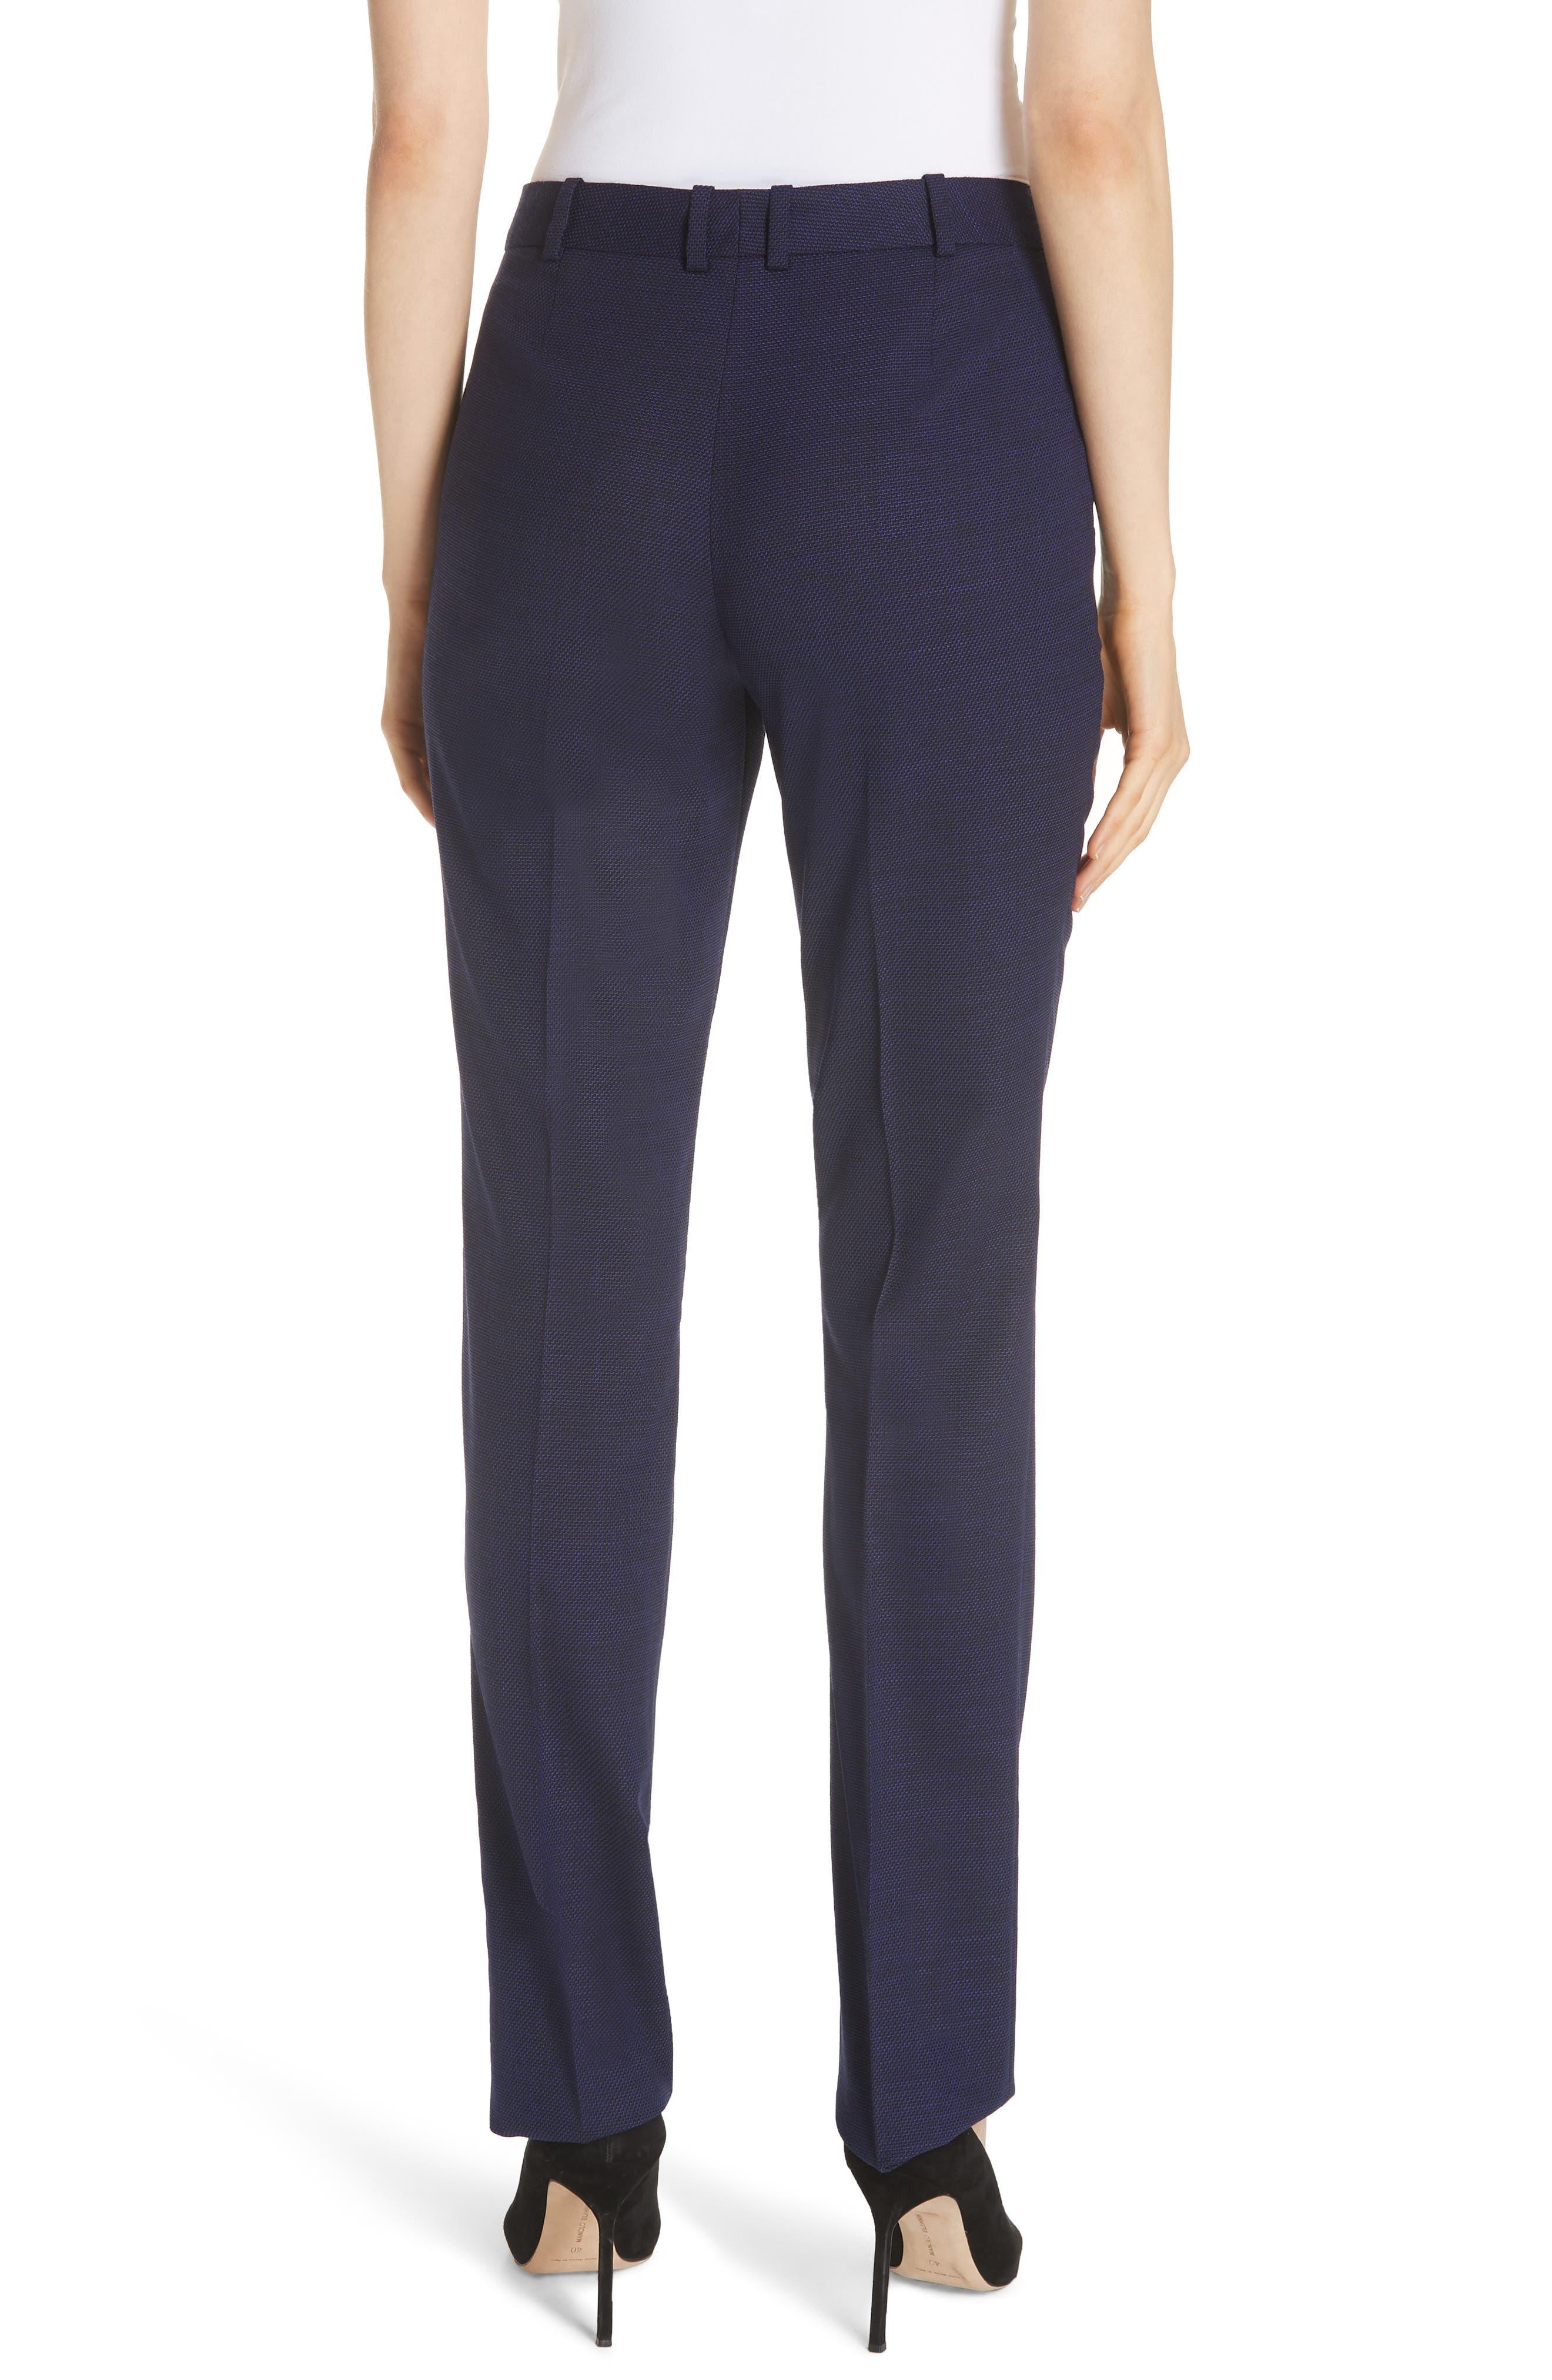 Titana Mini Glencheck Straight Leg Suit Pants,                             Alternate thumbnail 2, color,                             Deep Lilac Fantasy